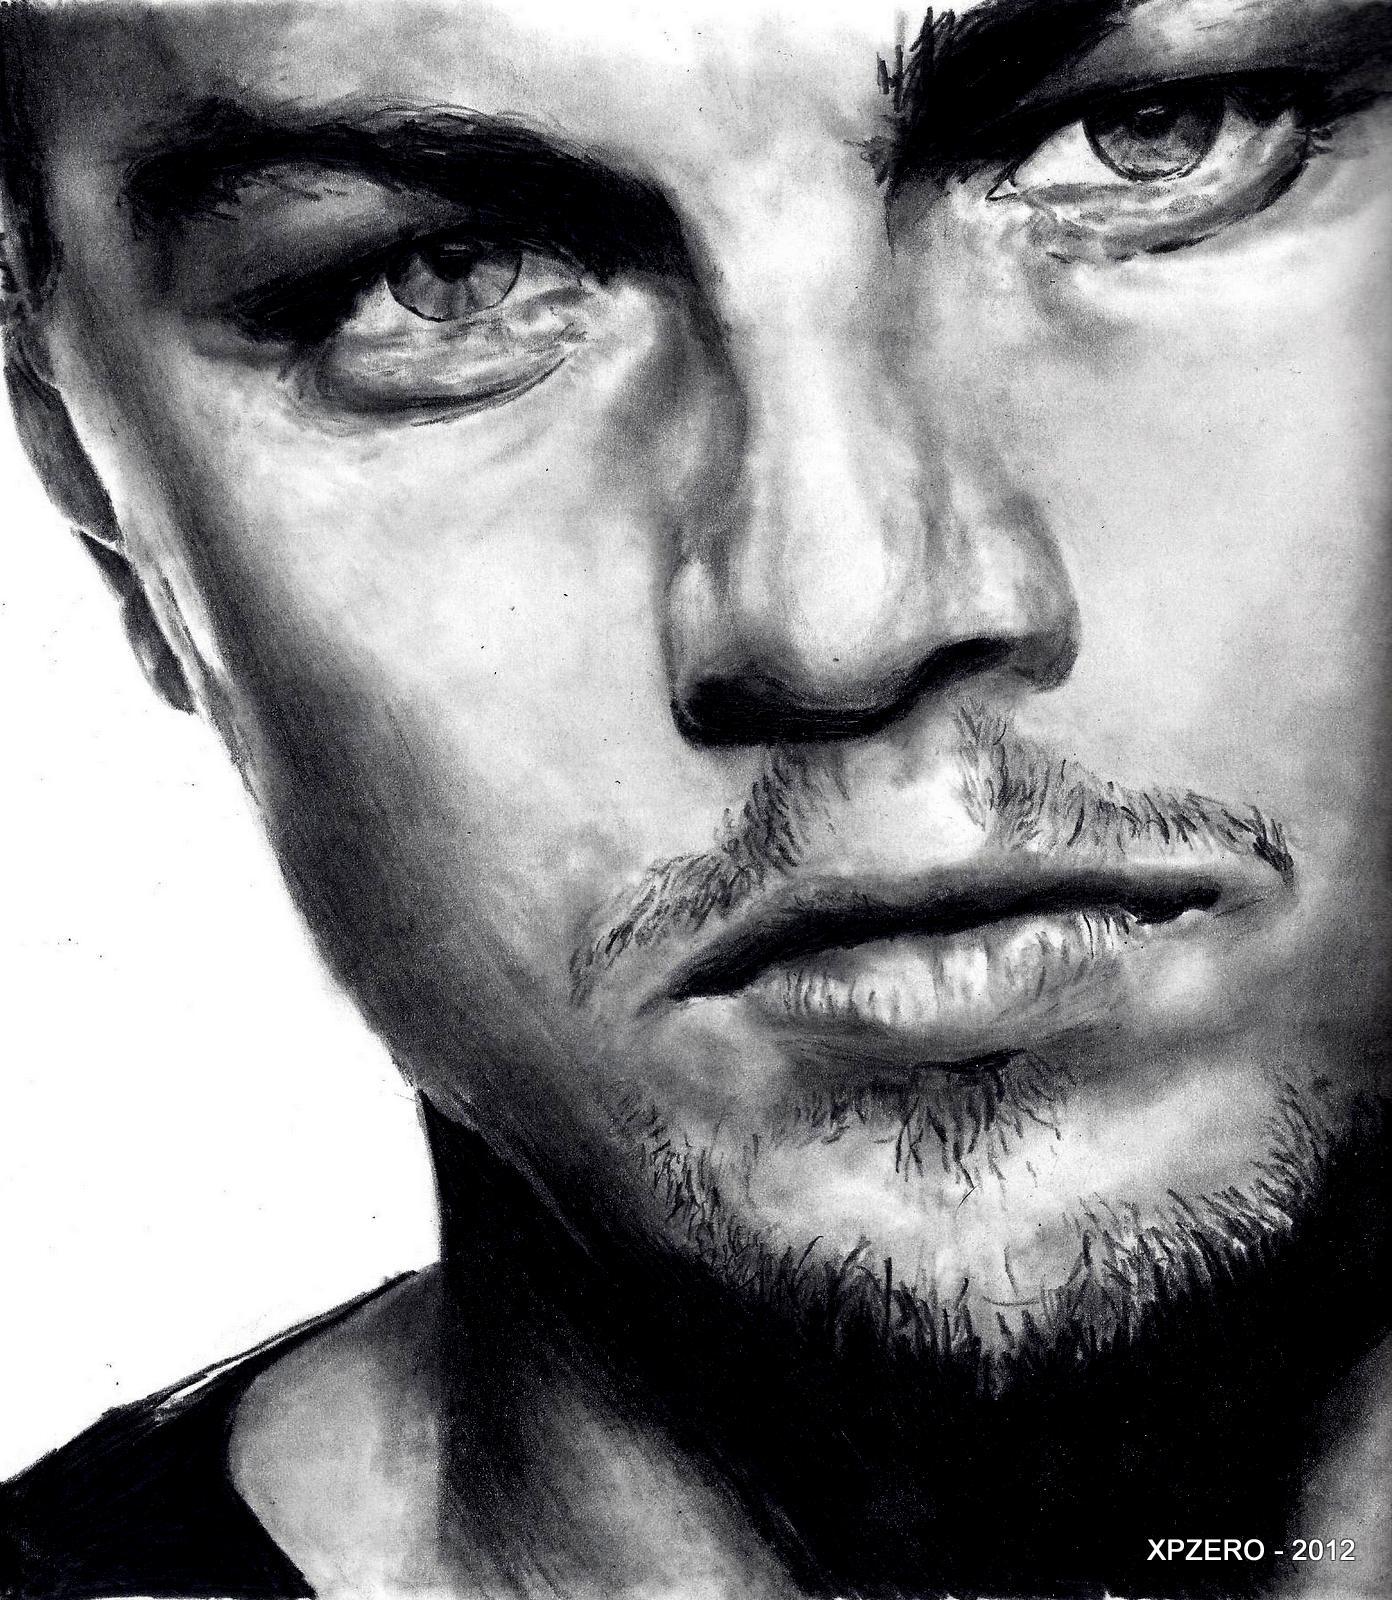 Leonardo Dicaprio by xpzero